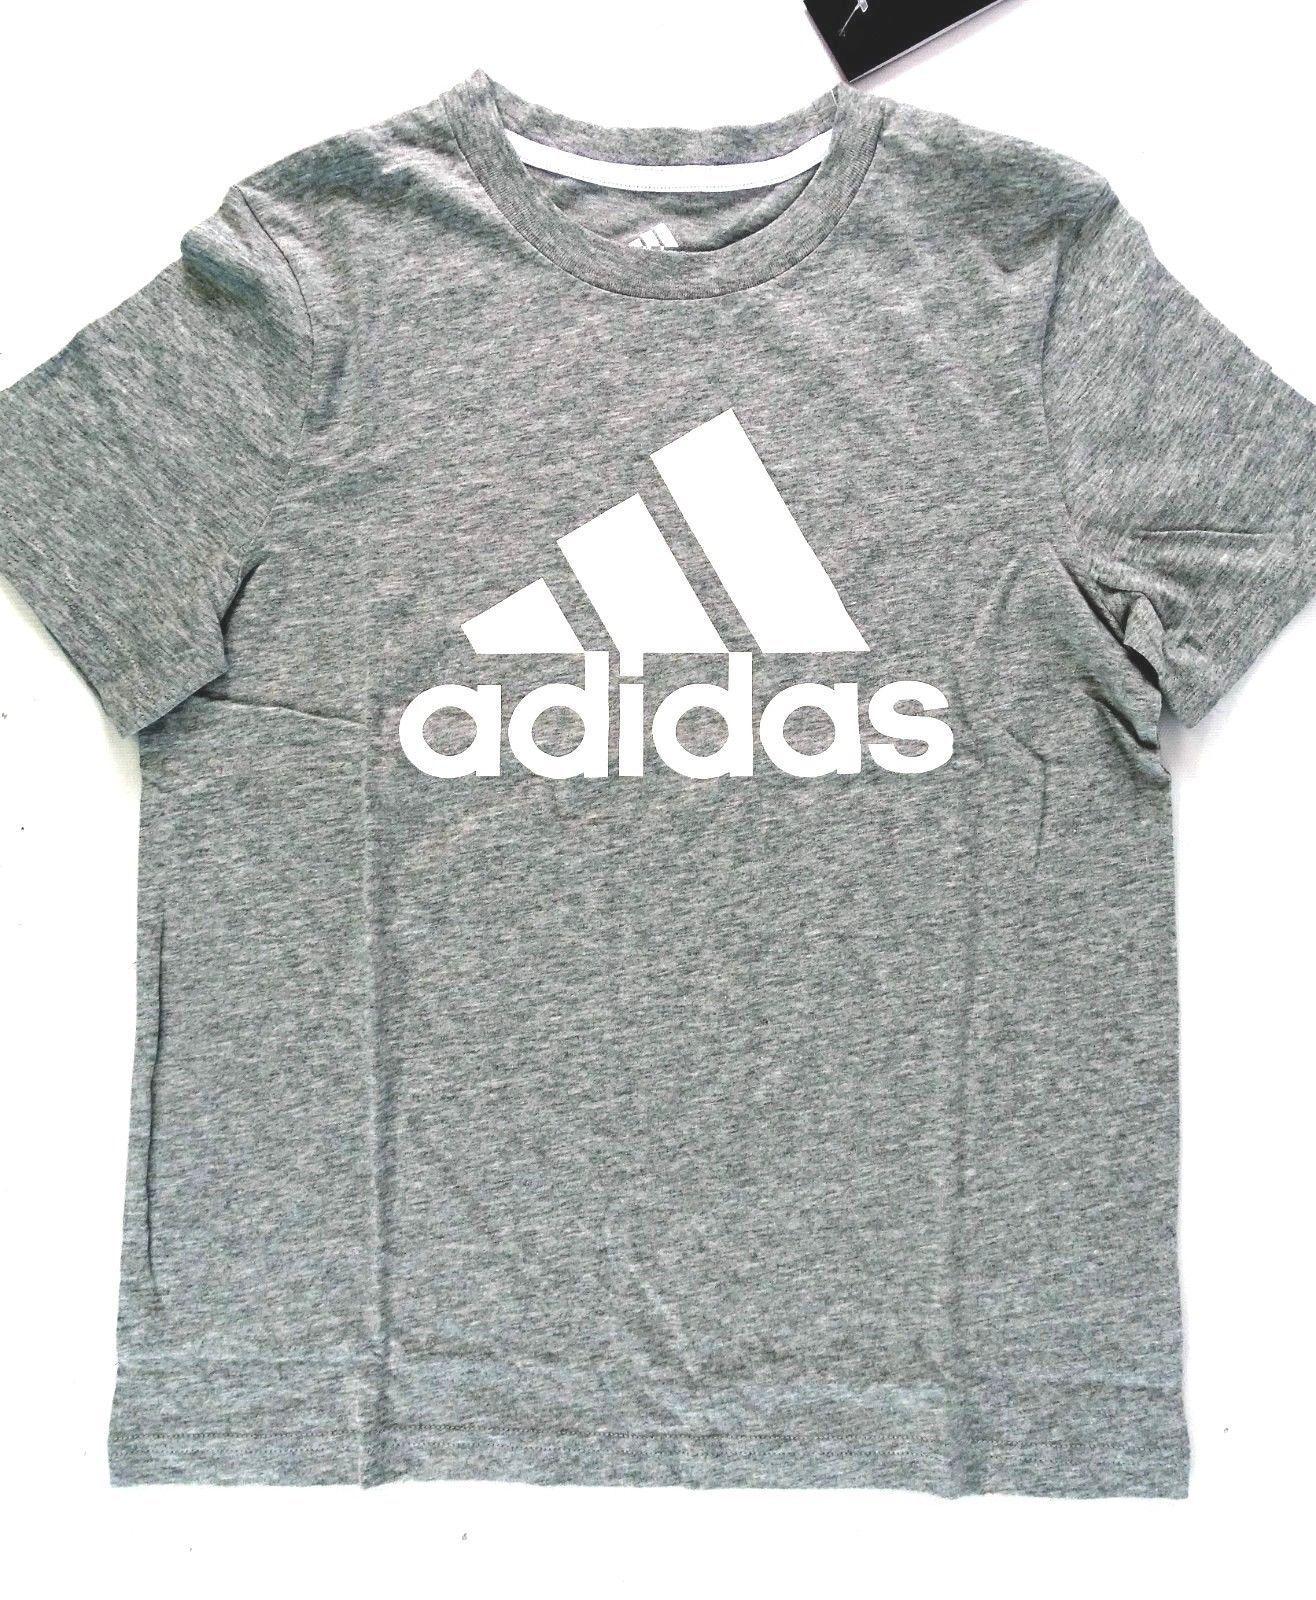 NEW Adidas Girls' Short Sleeve Cotton Tee - Grey Heather S-8